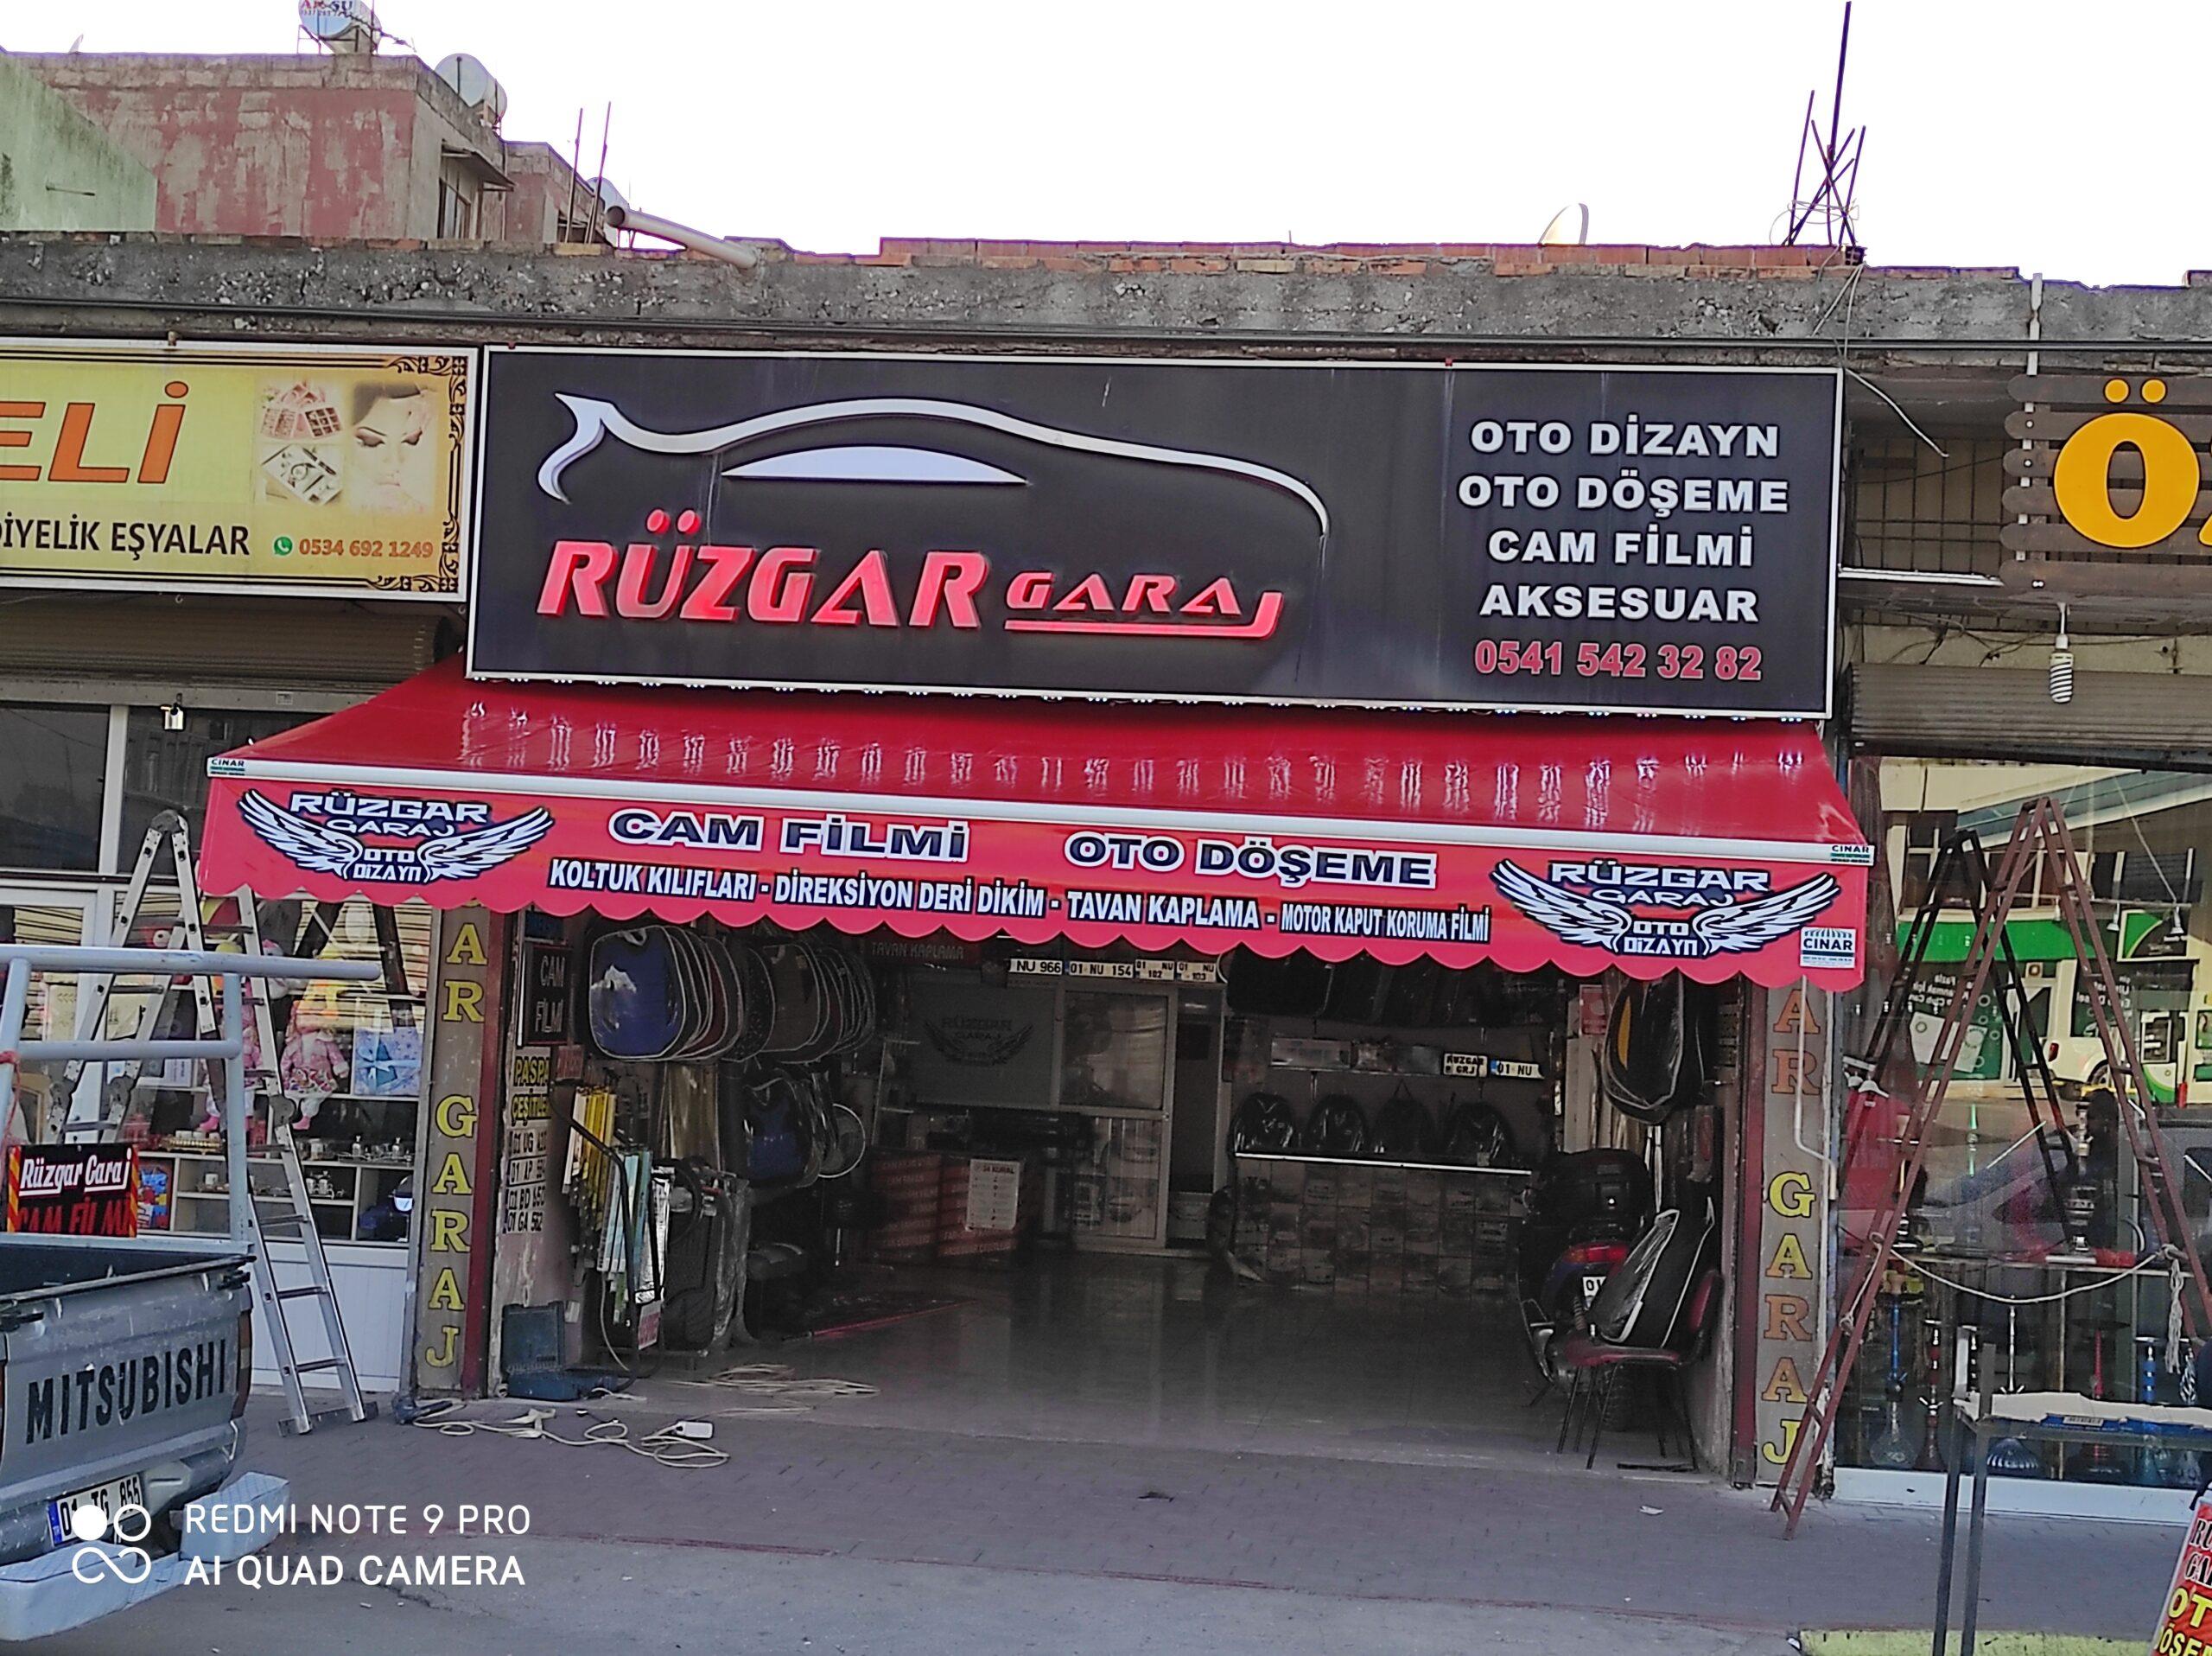 Adana mafsallı Tente Rüzgâr Garaj